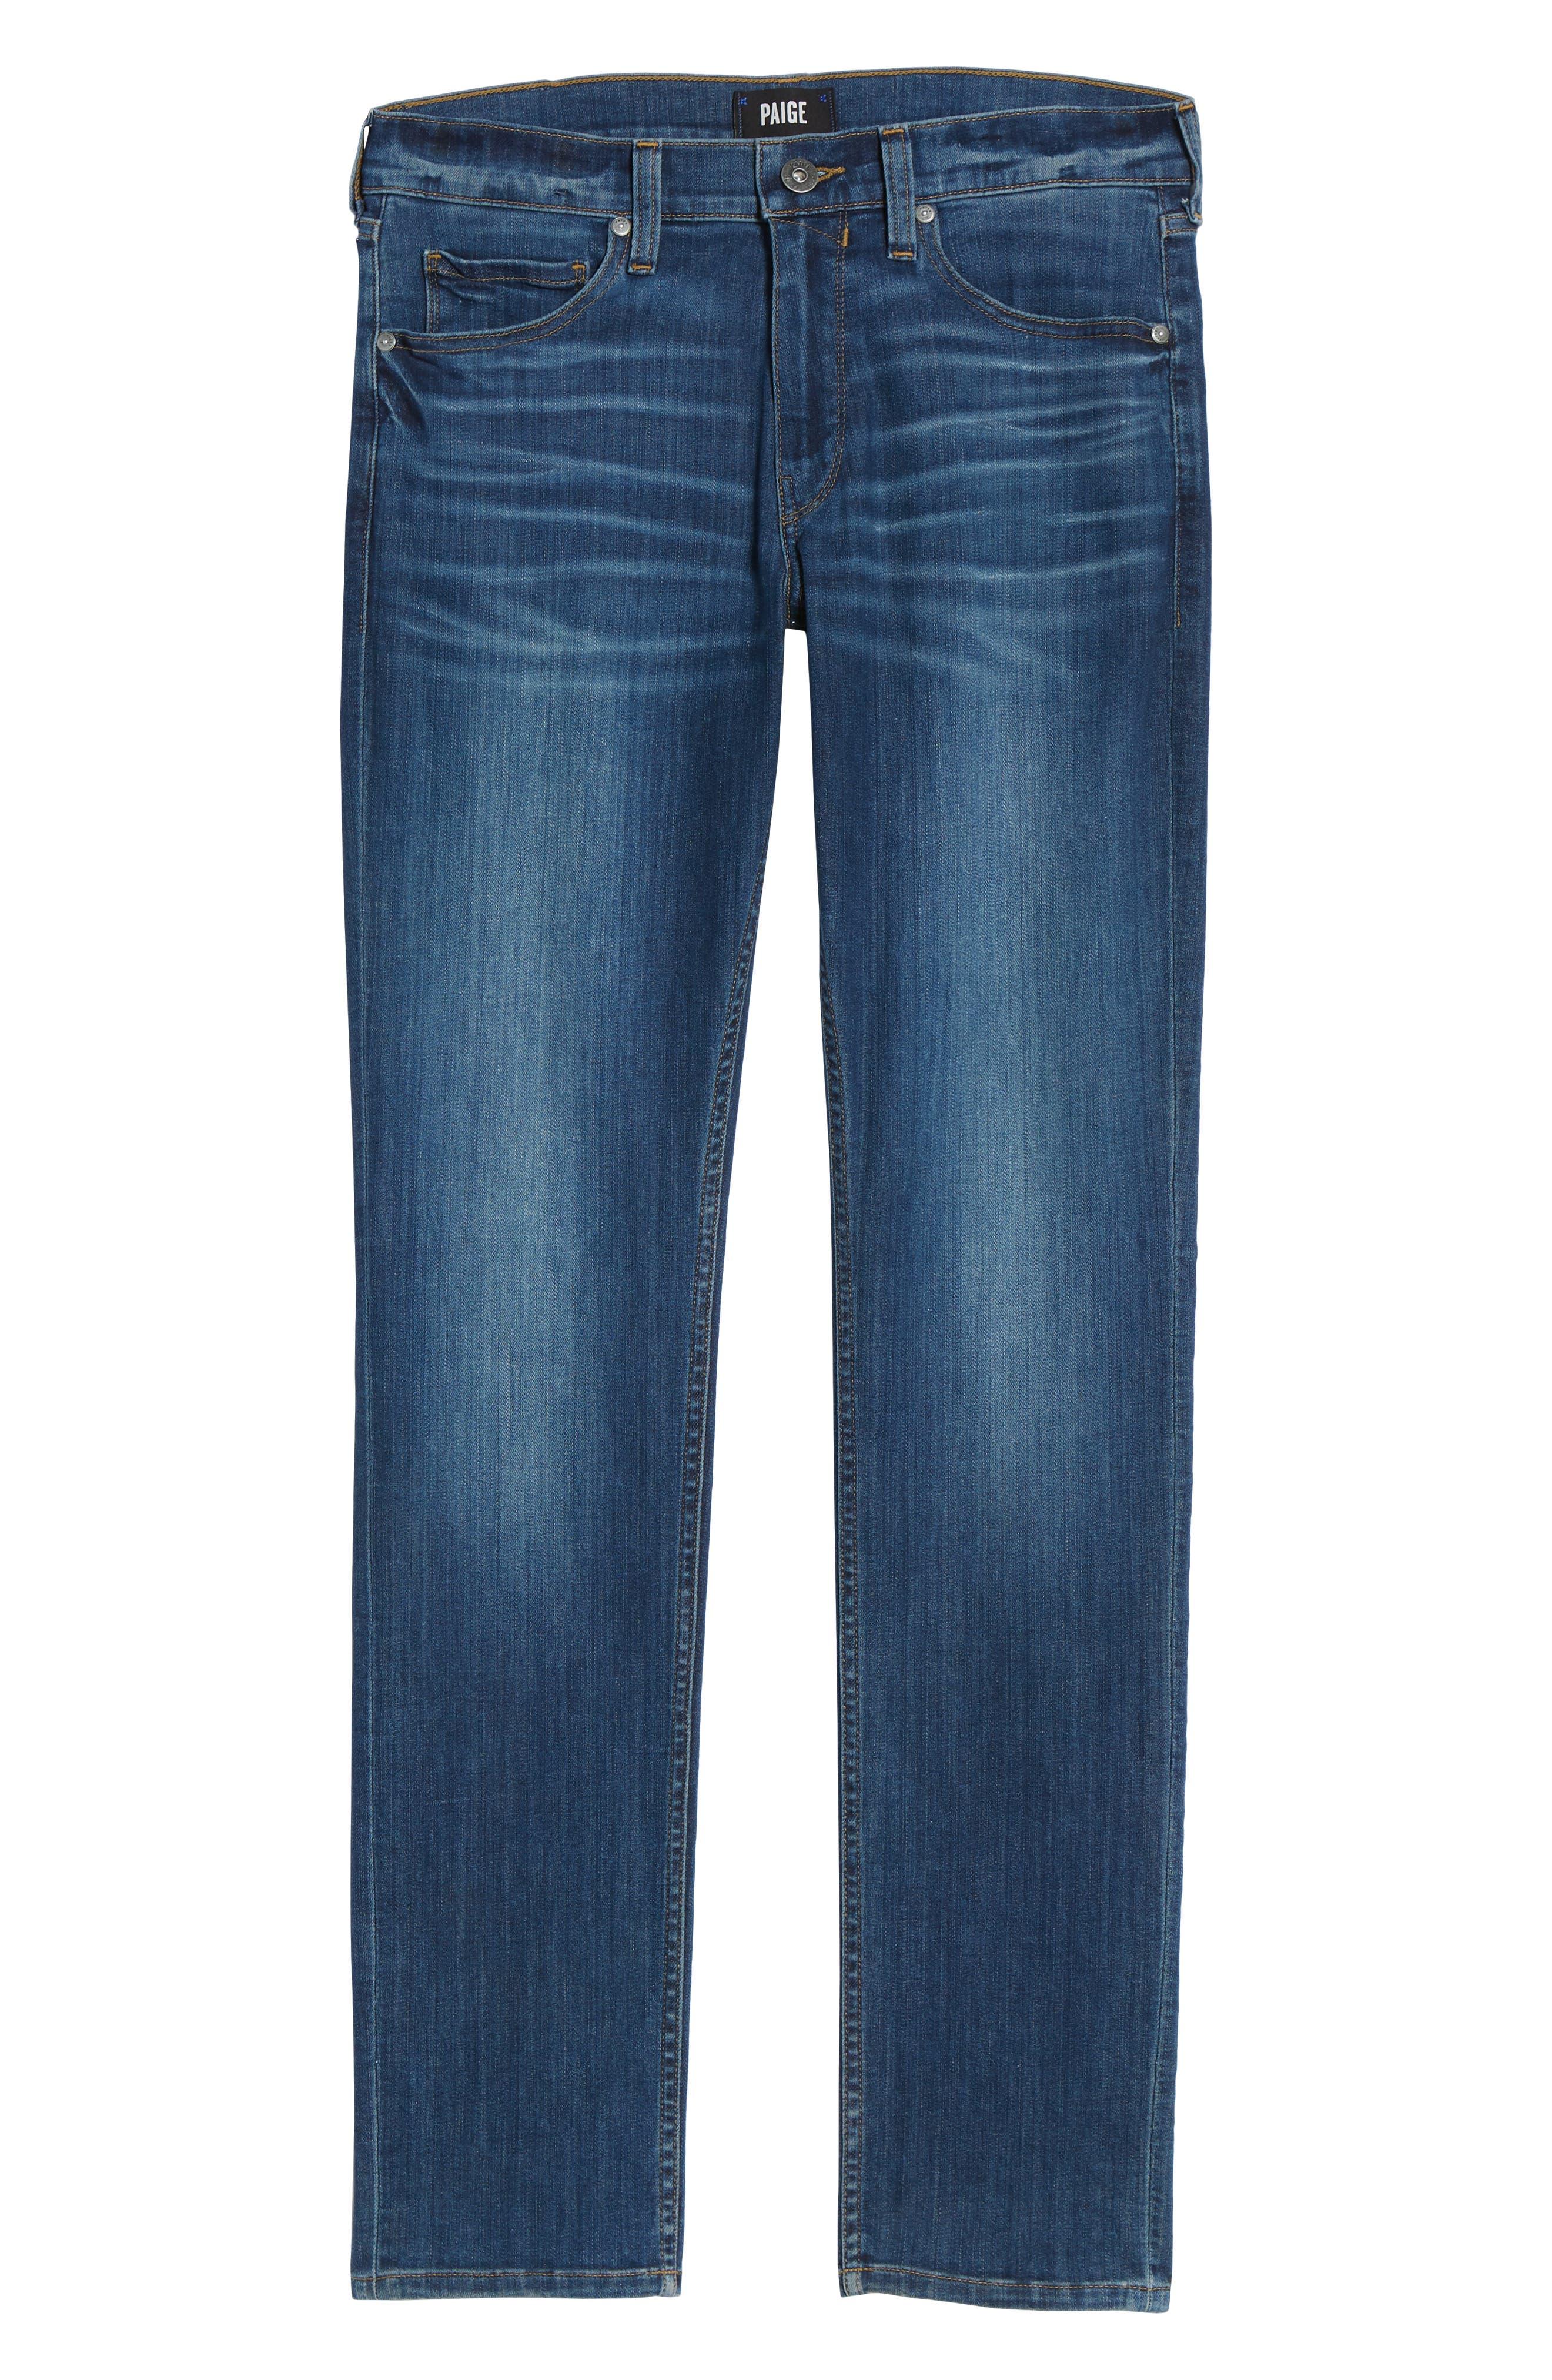 Transcend - Lennox Slim Fit Jeans,                             Alternate thumbnail 6, color,                             Ashbrook